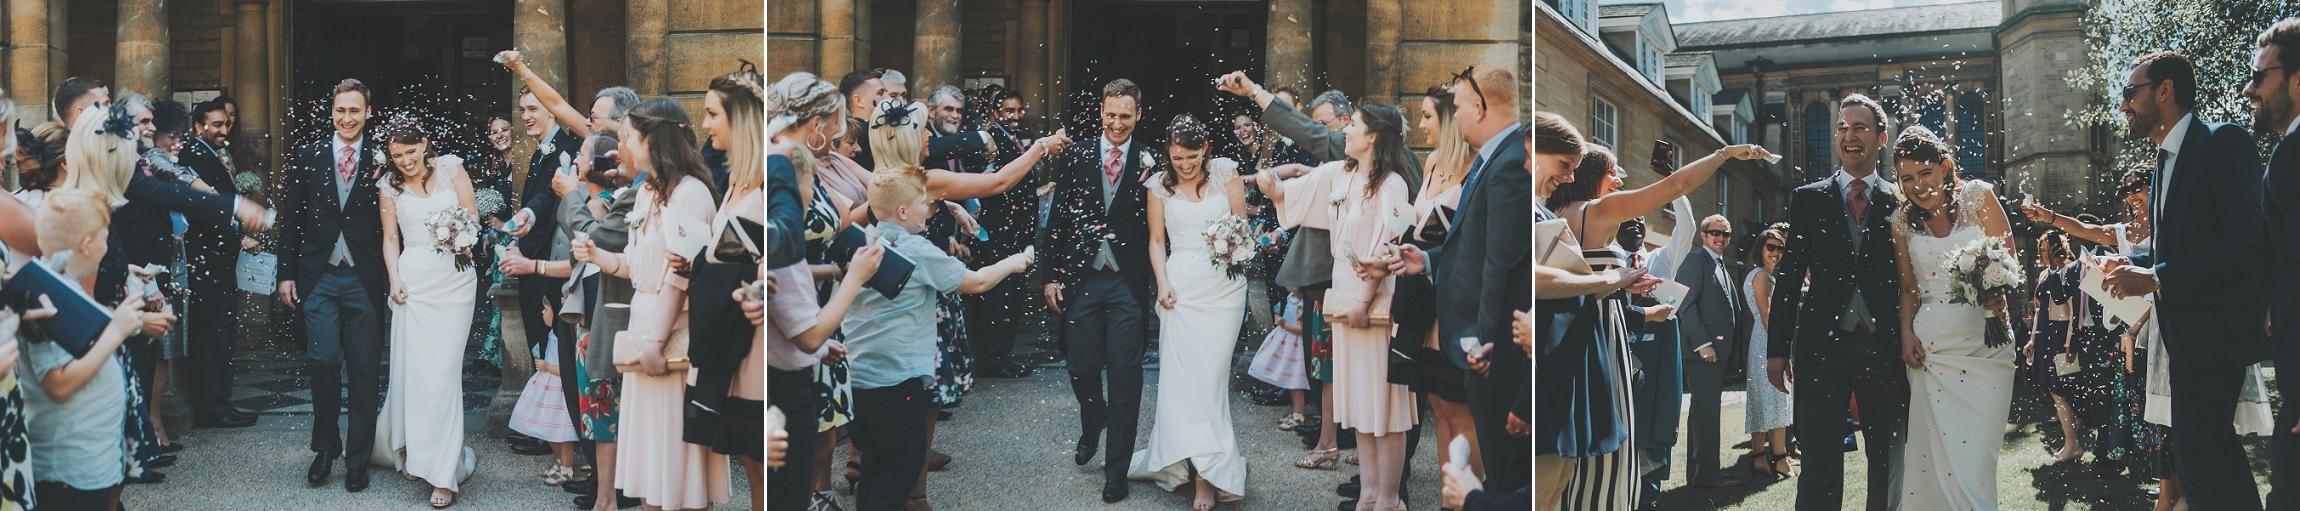 Oxford-Wedding-Photographer_0009.jpg